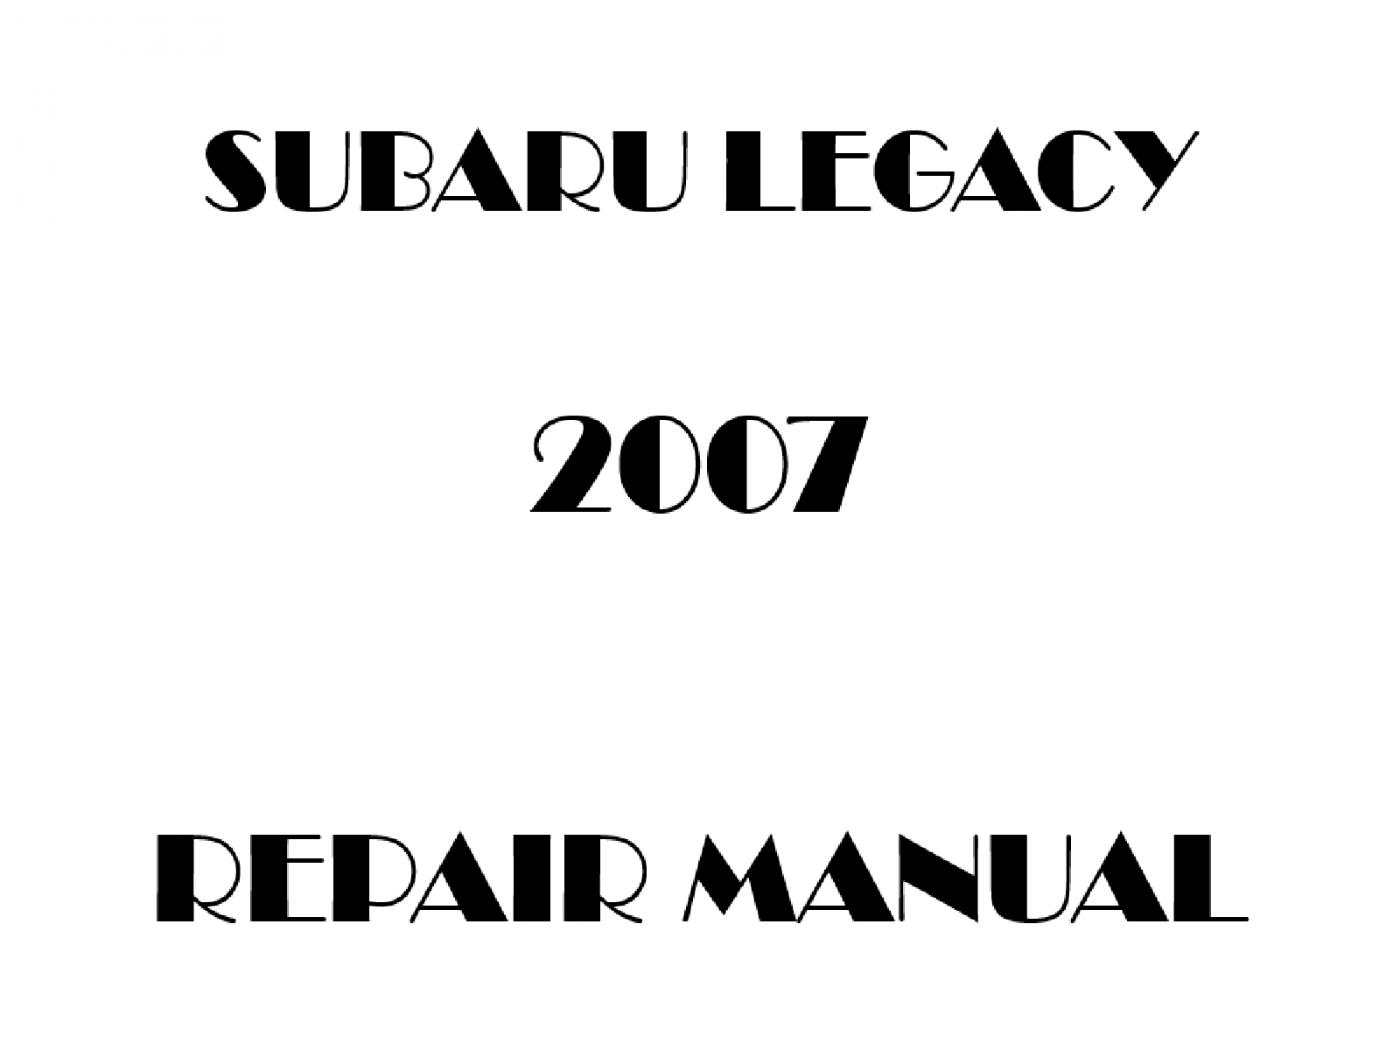 2007 Subaru Legacy repair manual